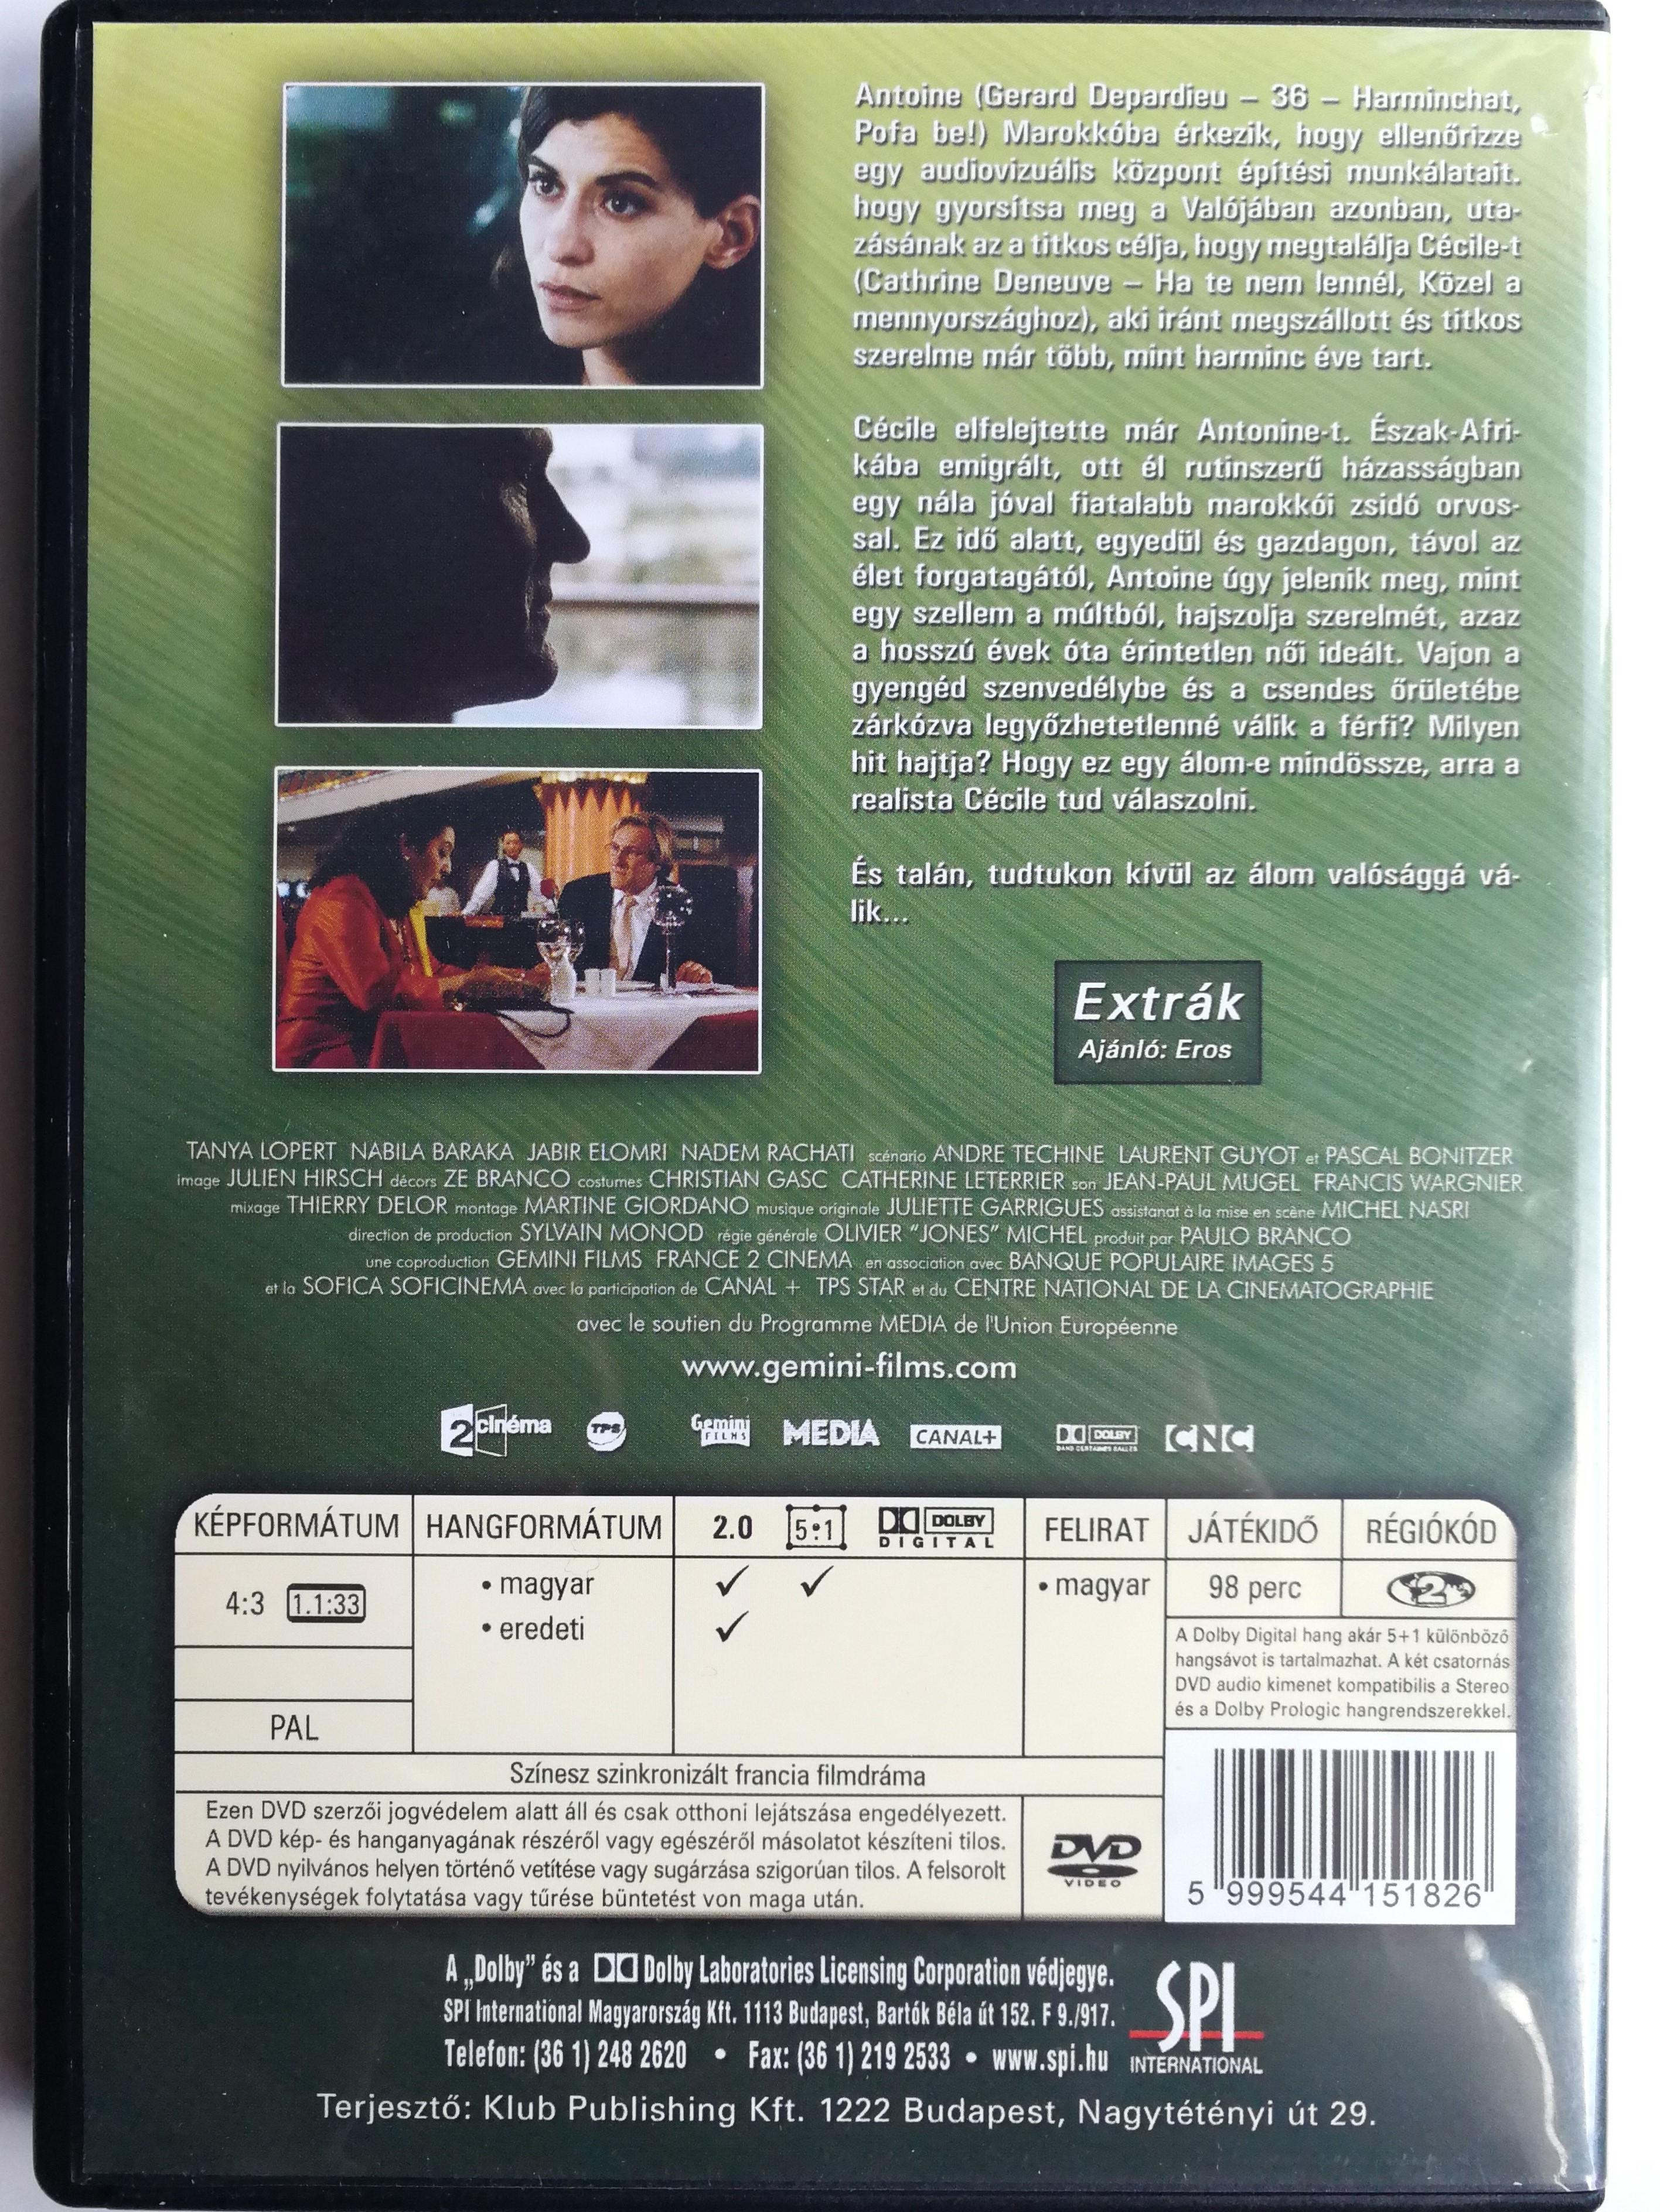 les-temps-qui-changent-dvd-2004-v-ltoz-id-k-2.jpg